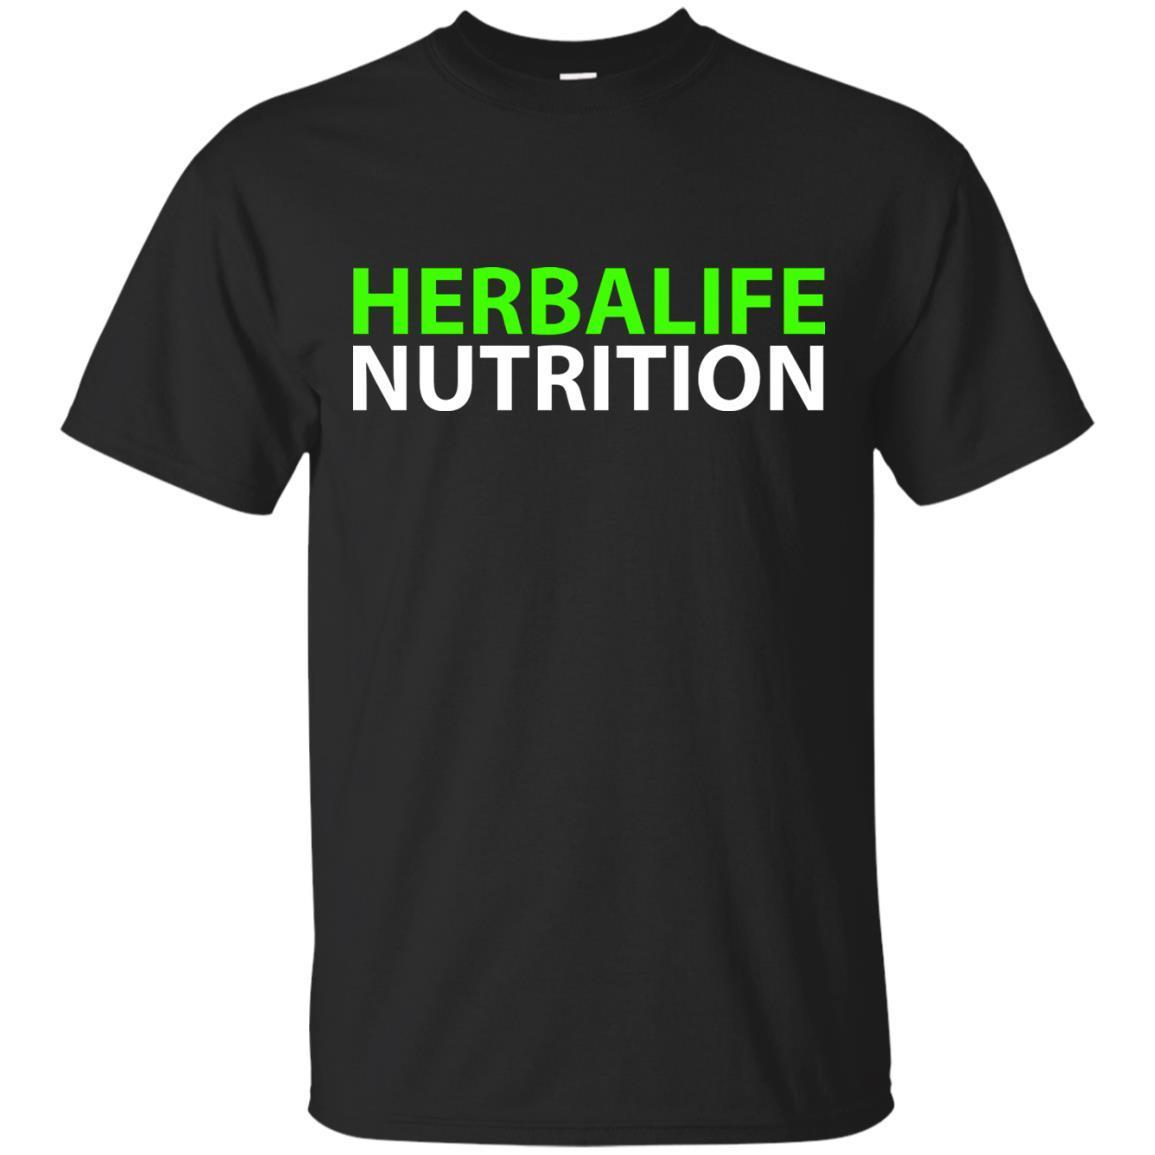 HERBALIFE NUTRITION T-Shirt – White Design